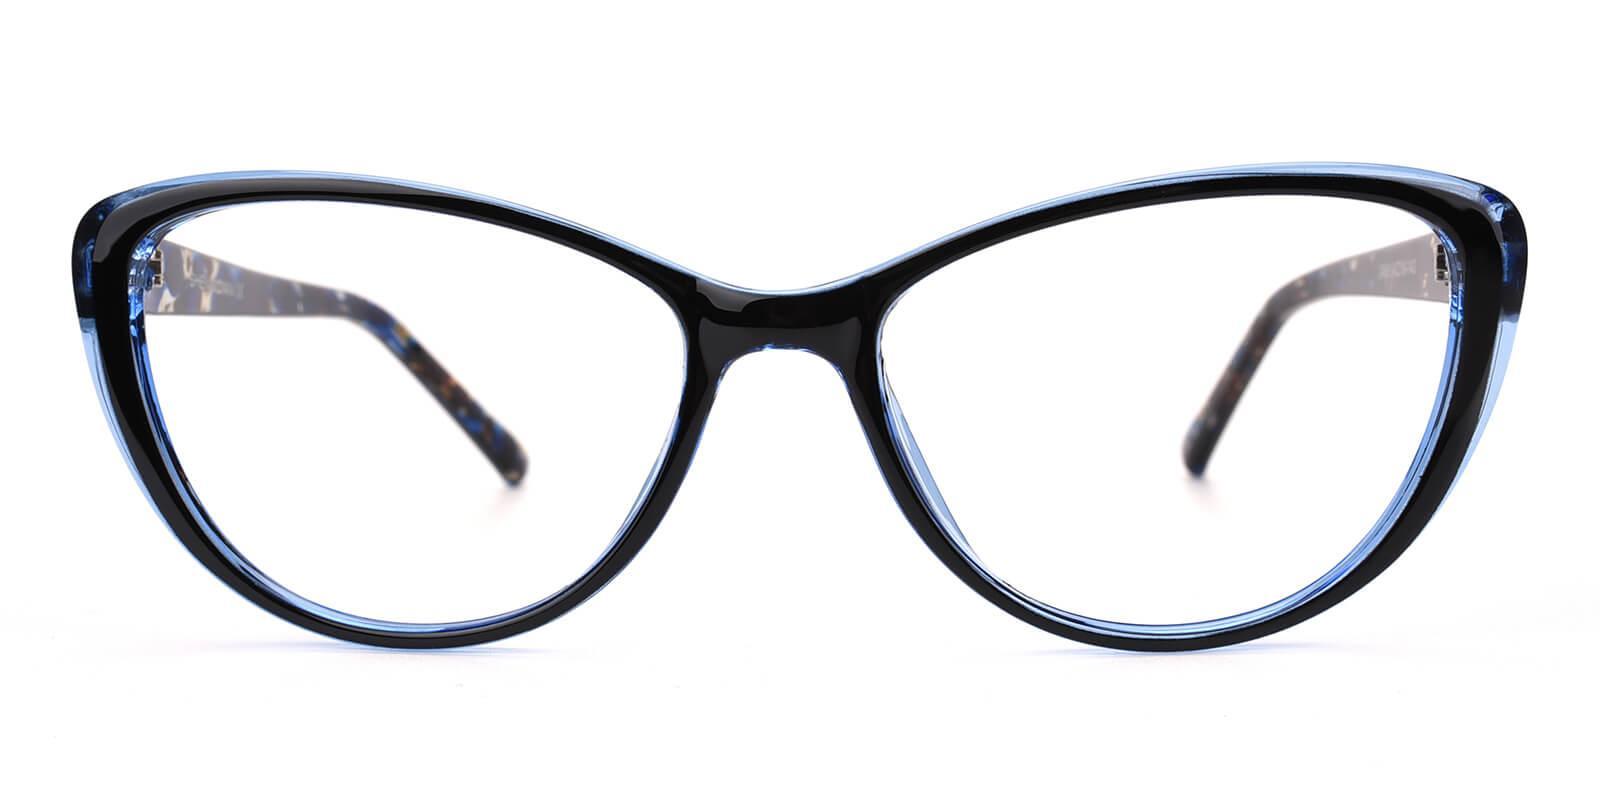 Slackey-Blue-Oval / Cat-Acetate-Eyeglasses-additional2